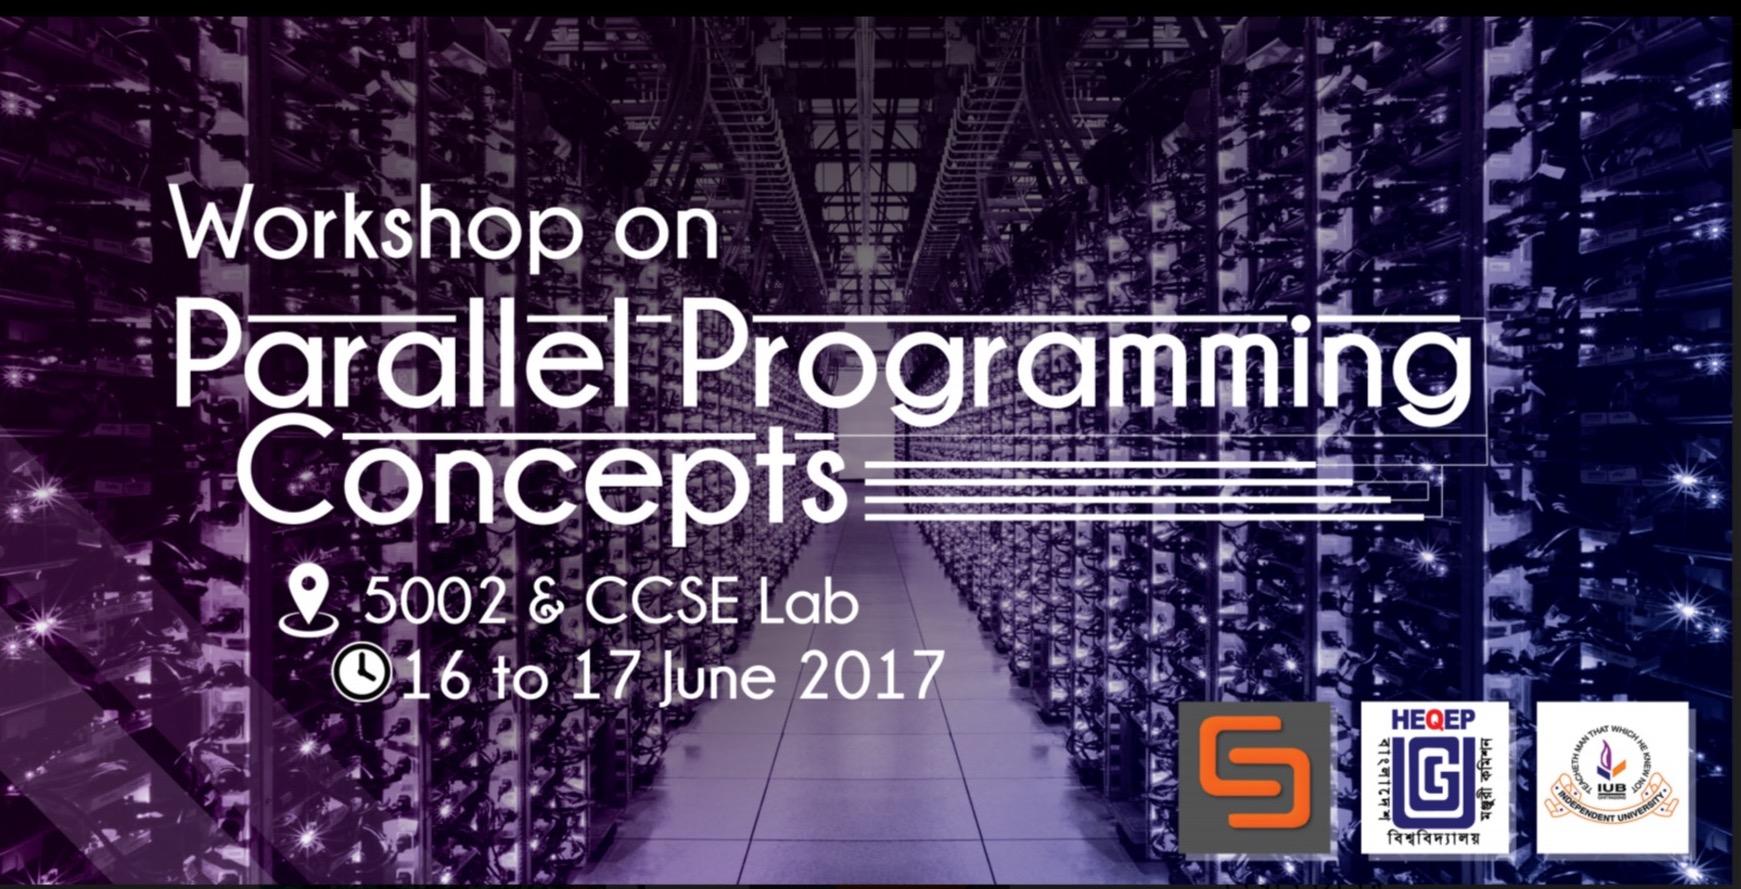 Workshop on Parallel Programming Concepts